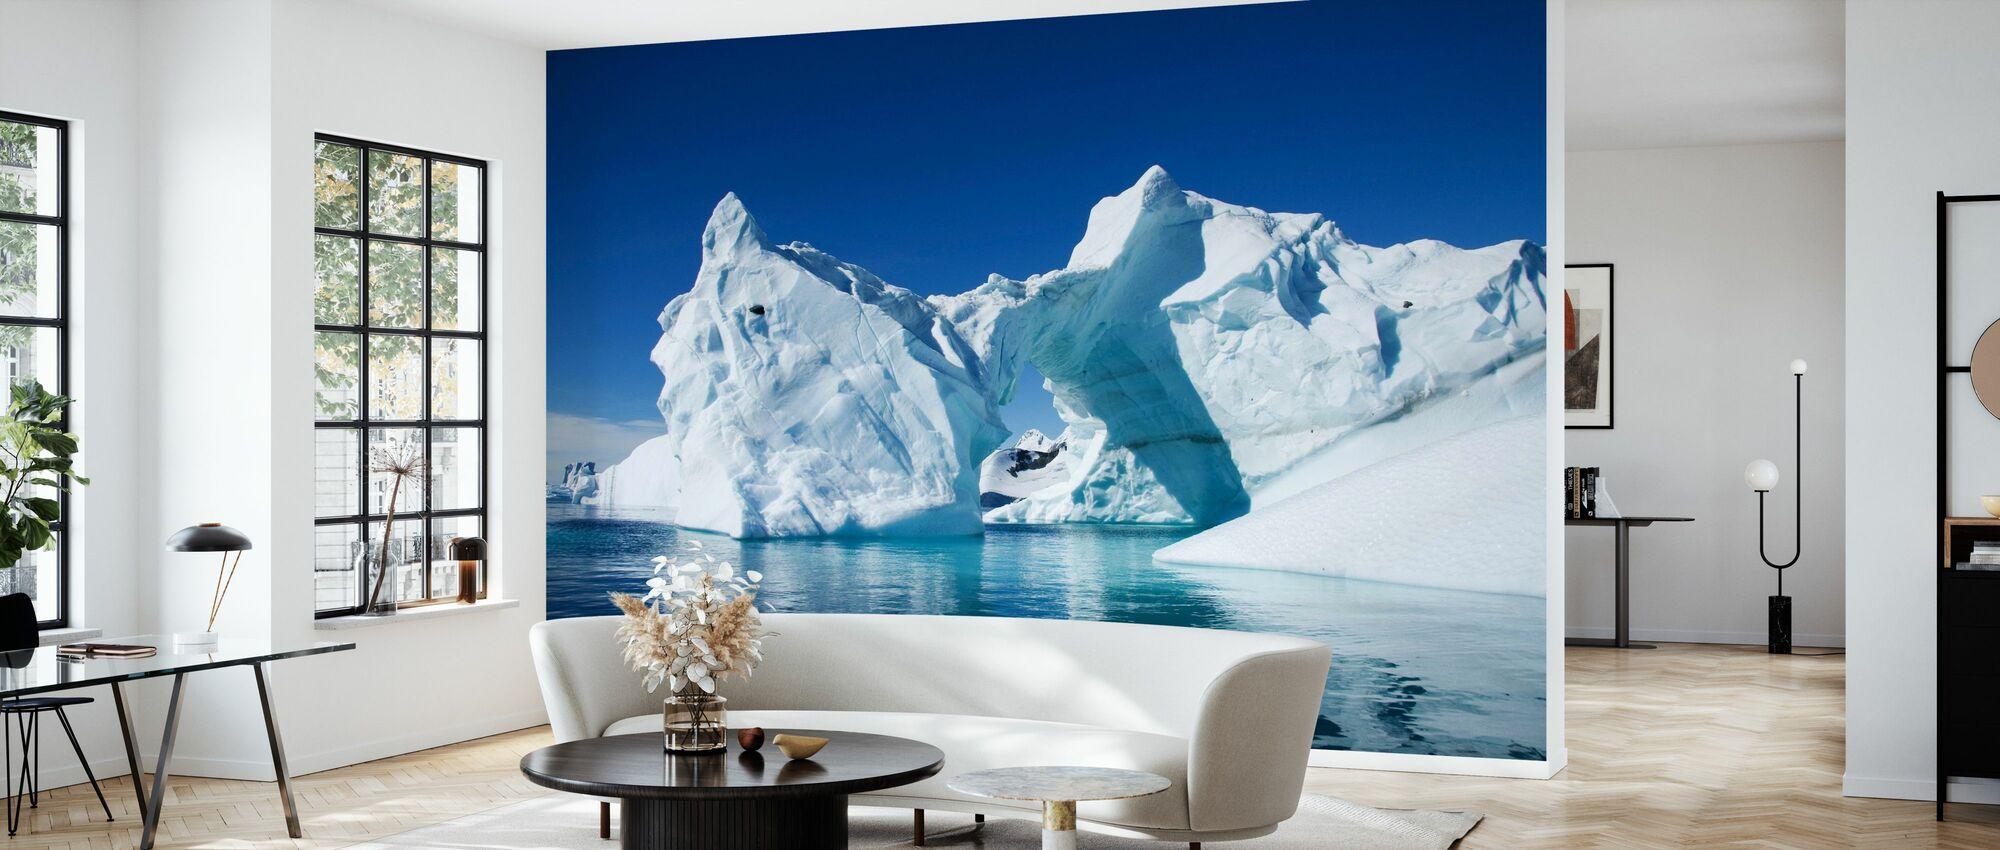 Iceberg Antarctica - Wallpaper - Living Room